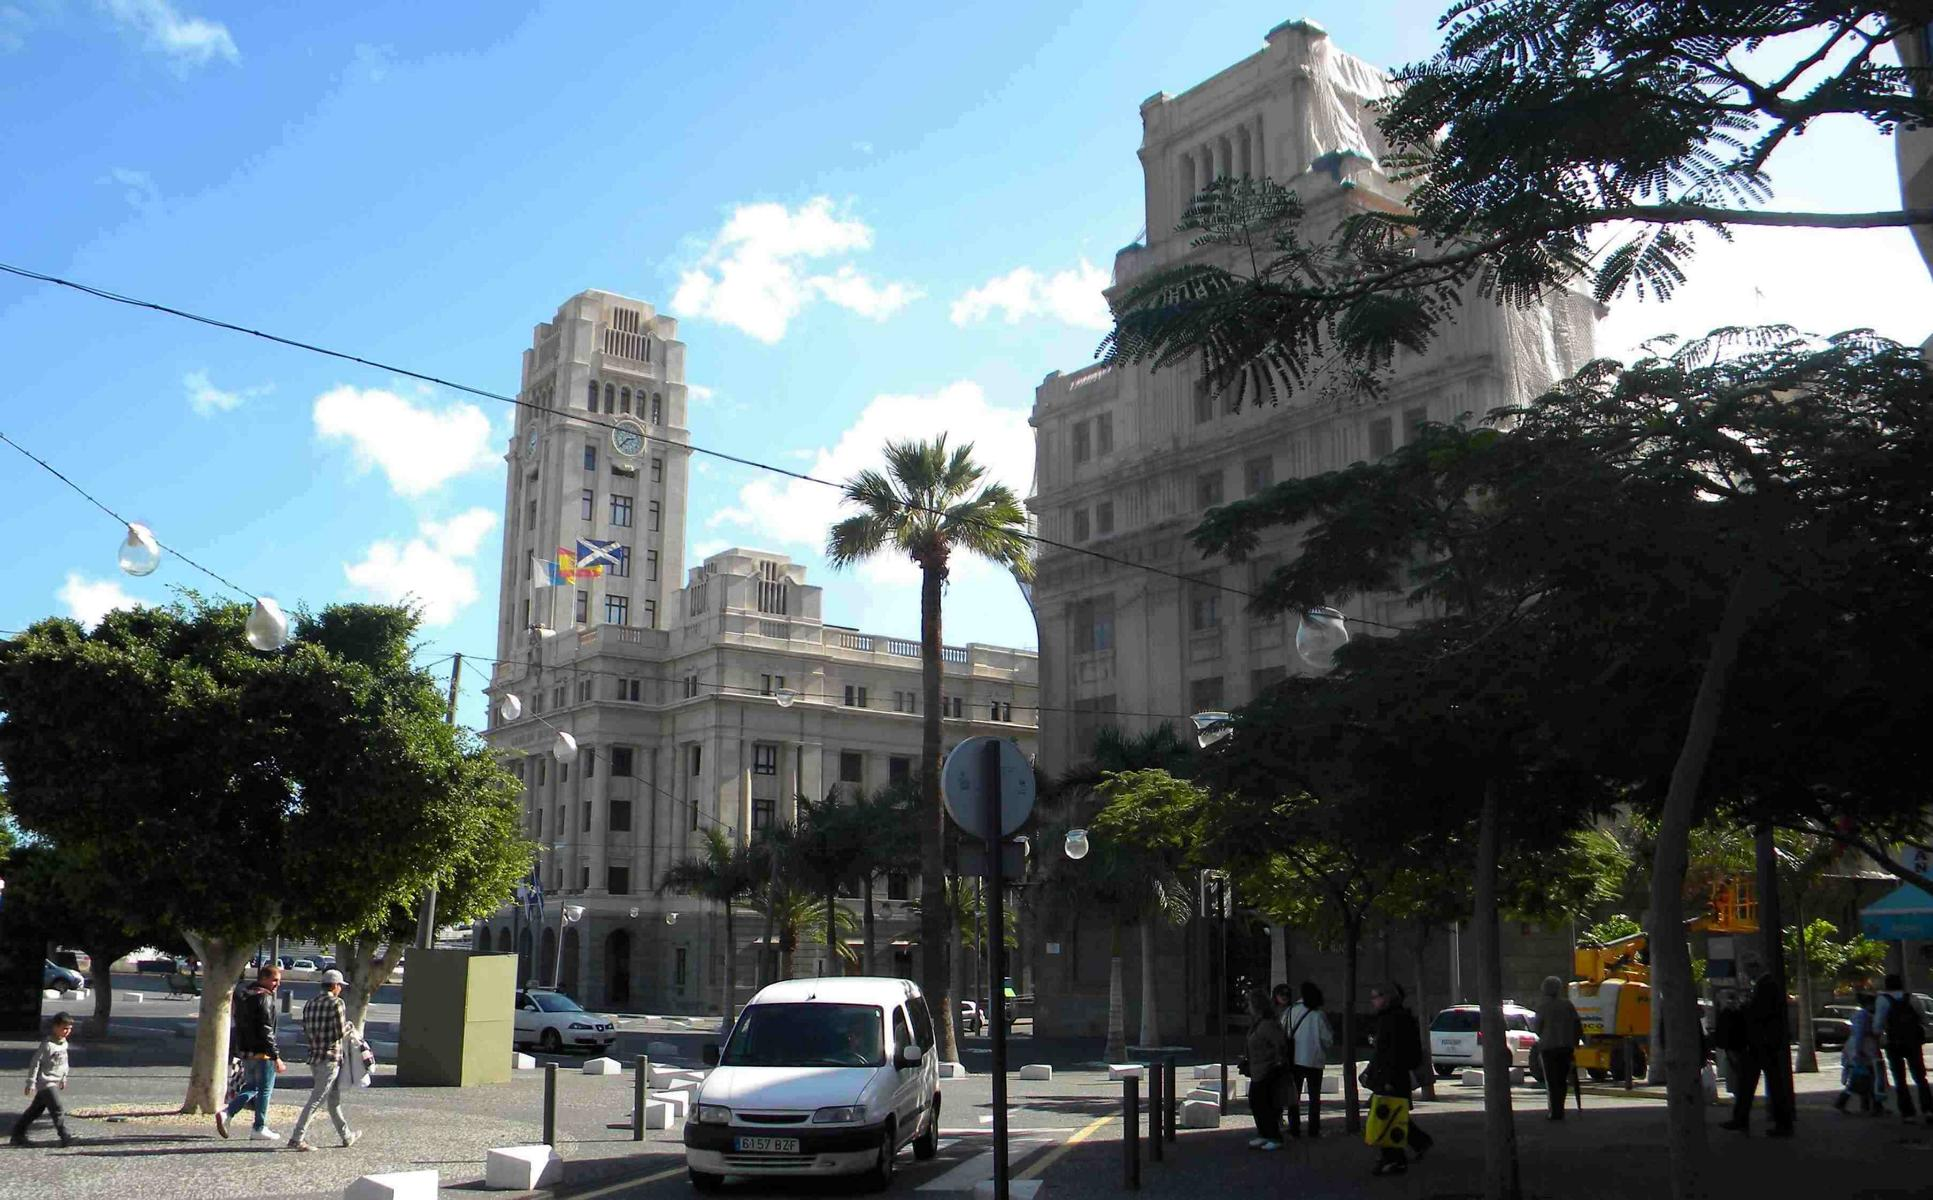 Cabildo Insular de Tenerife - Kommunalverwalrung